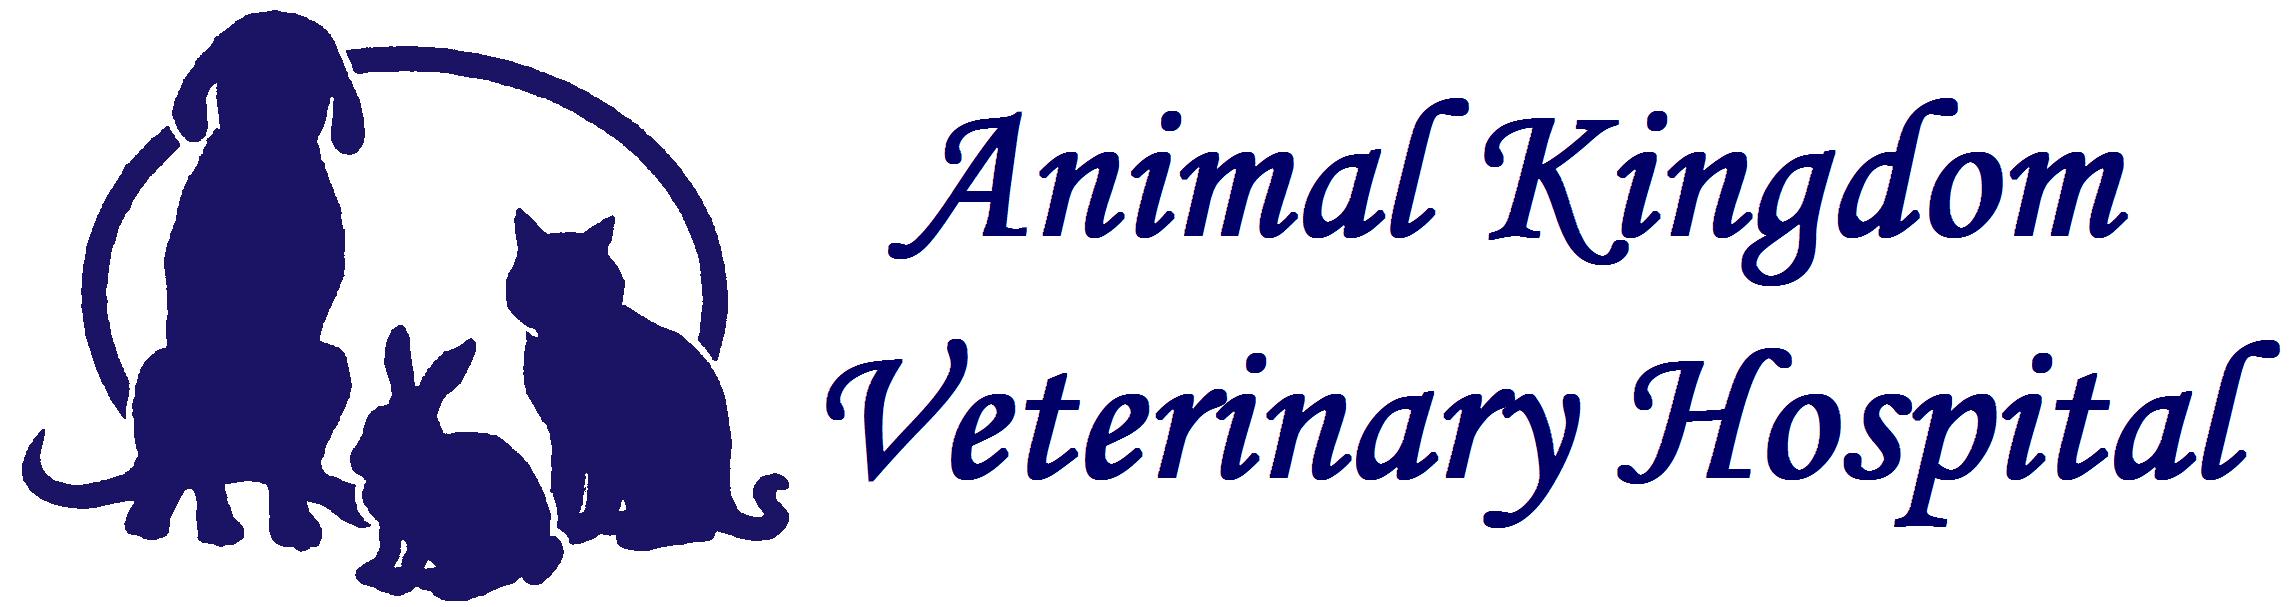 Animal Kingdom Veterinary Hospital